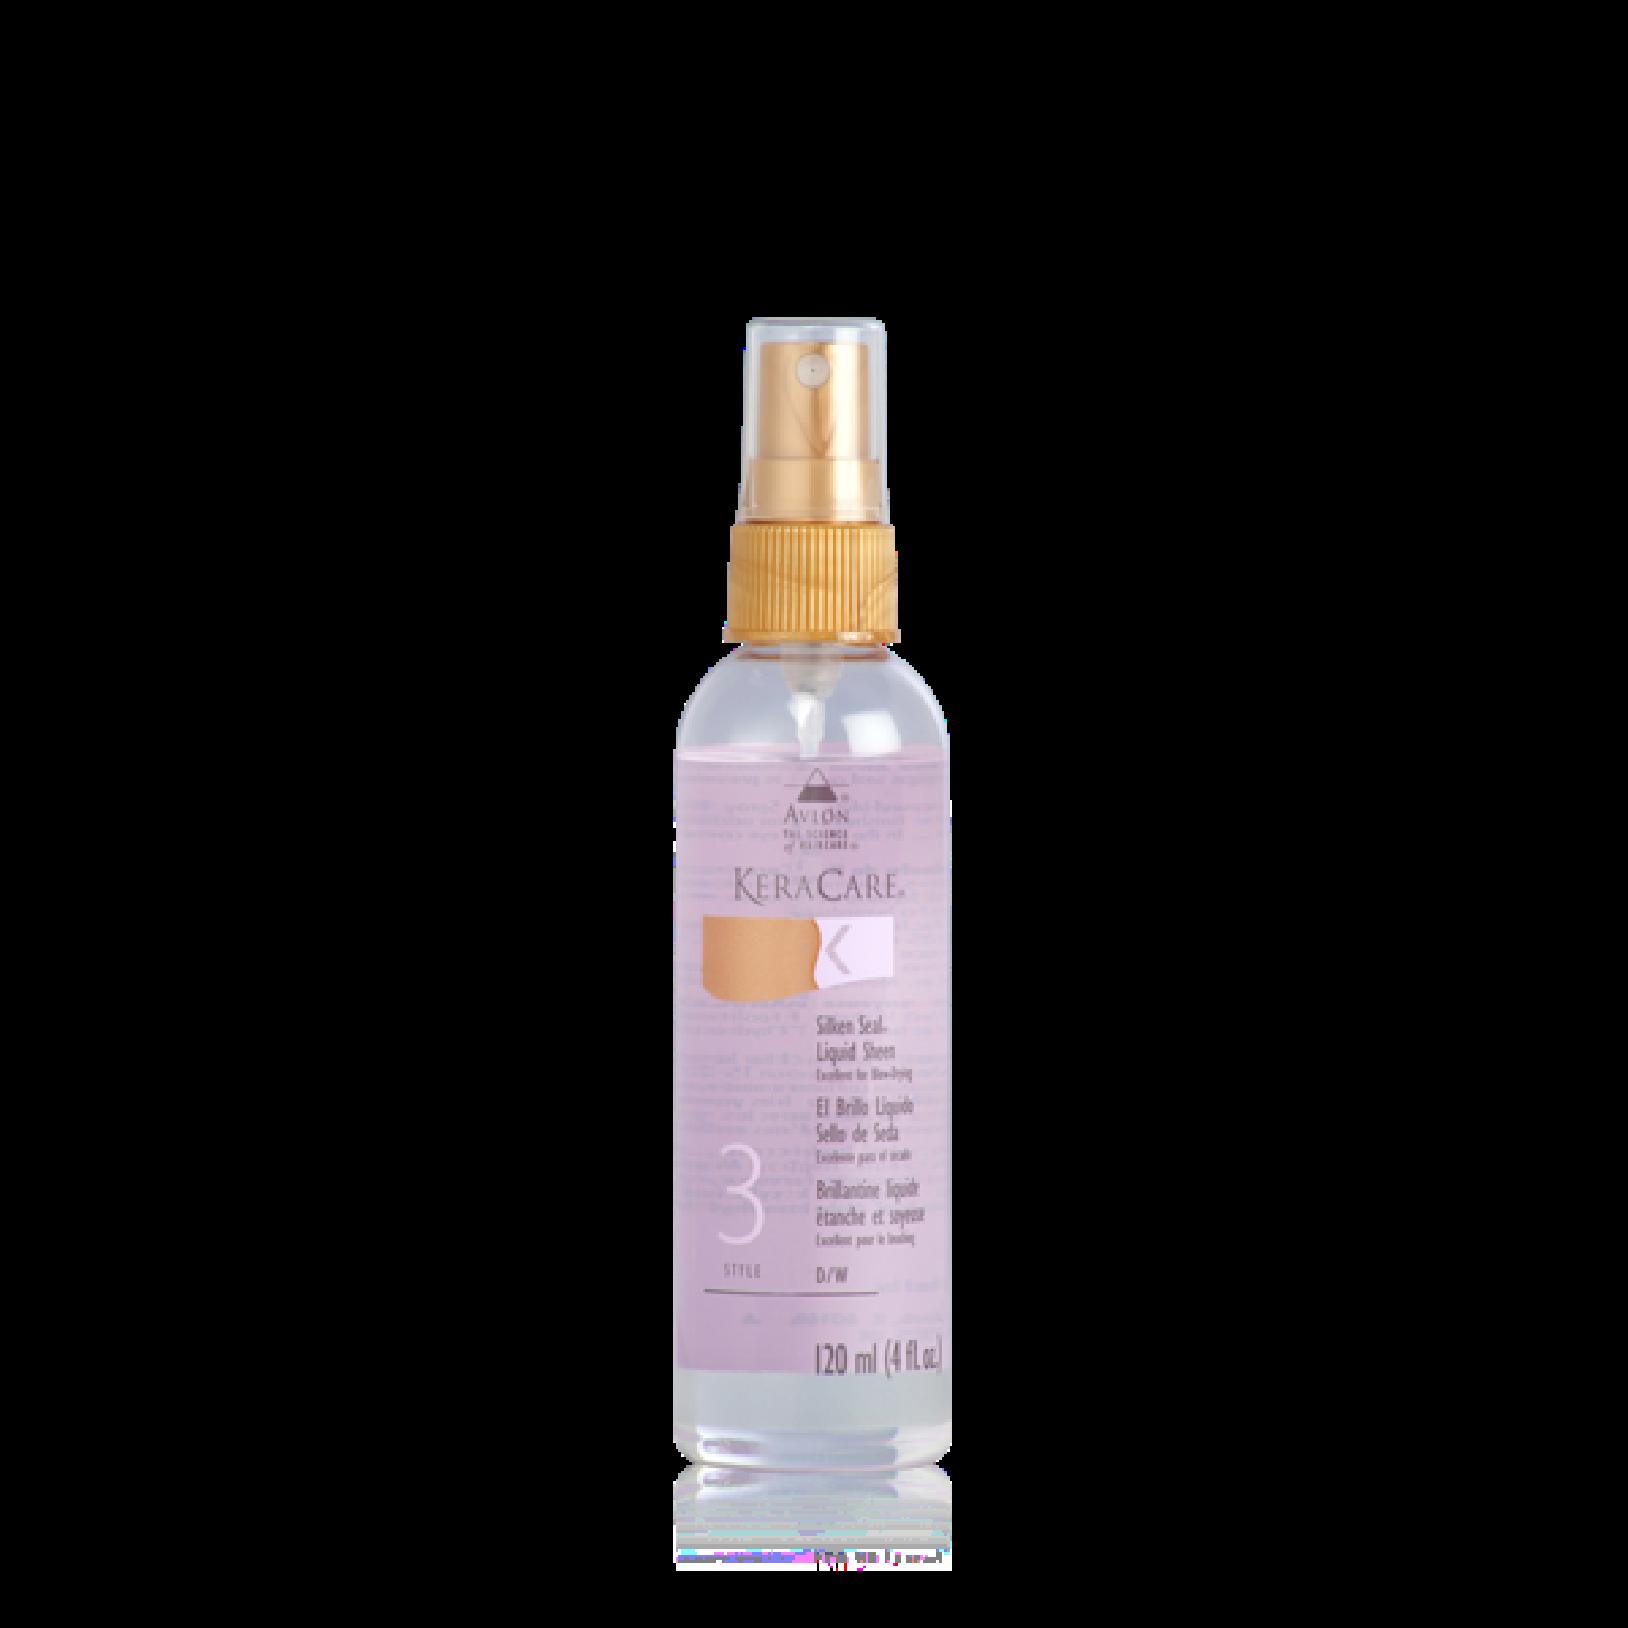 keracare-product-image-Silken-Seal_-Liquid-Sheen_600x